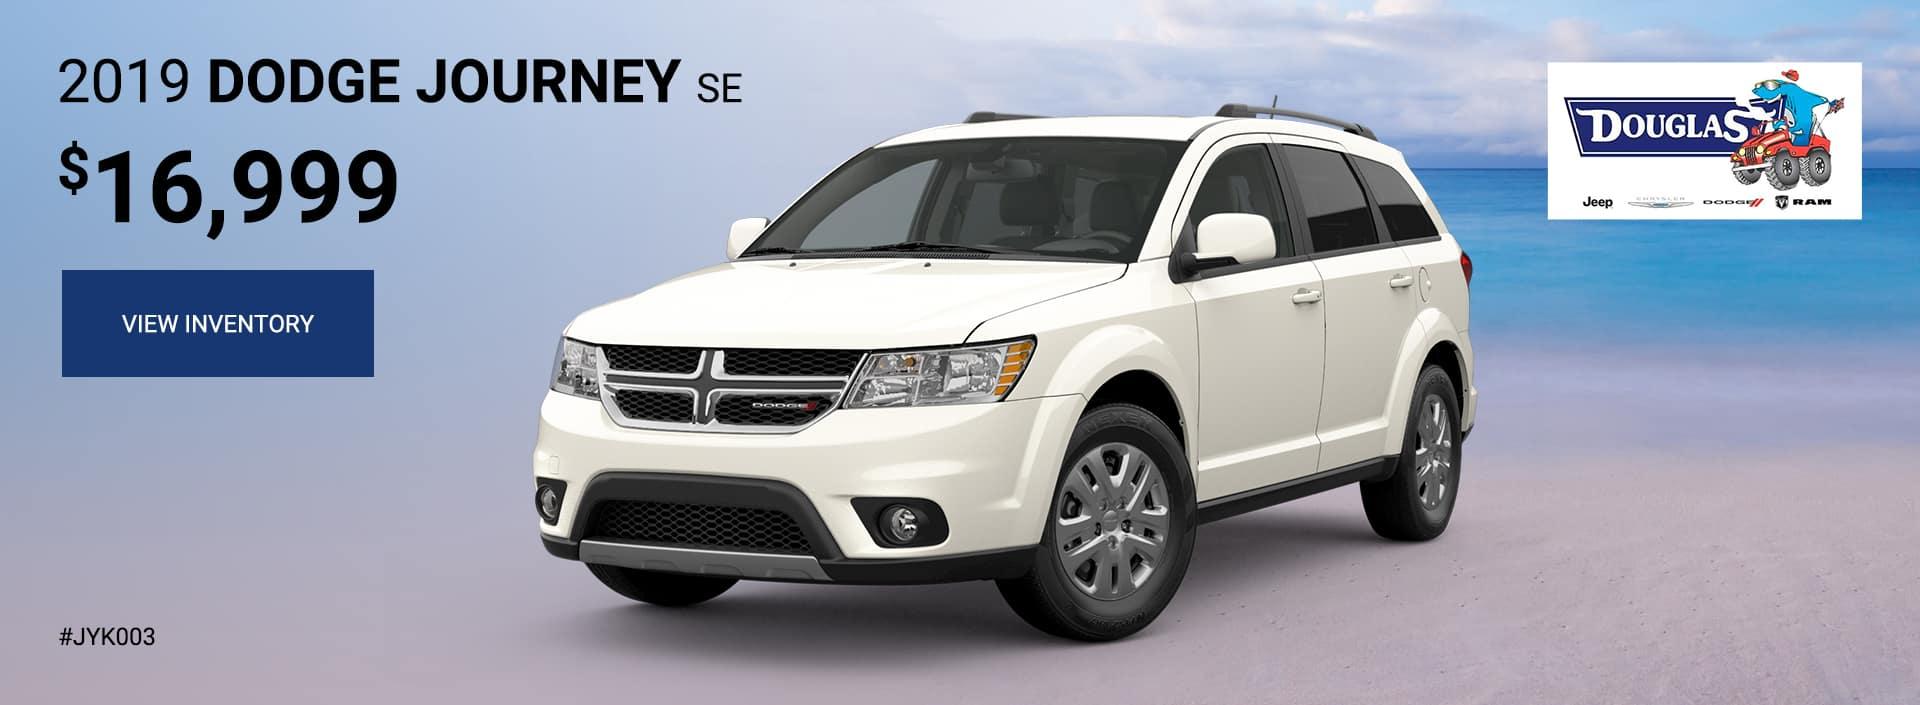 2019 Dodge Journey Lease Deal